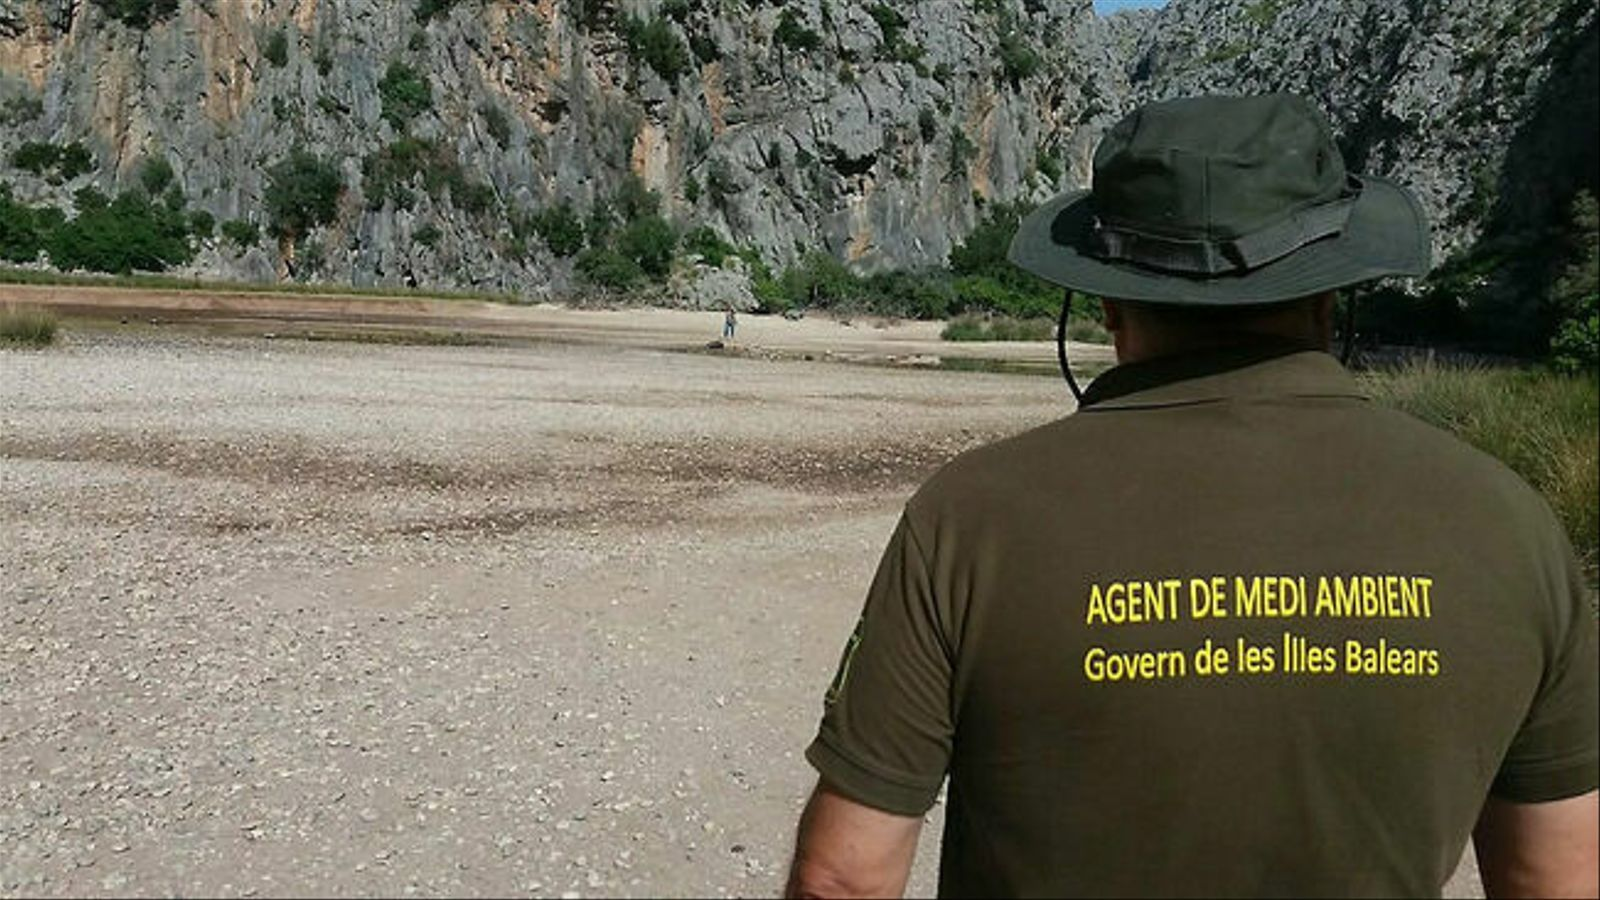 Agent de Medi Ambient